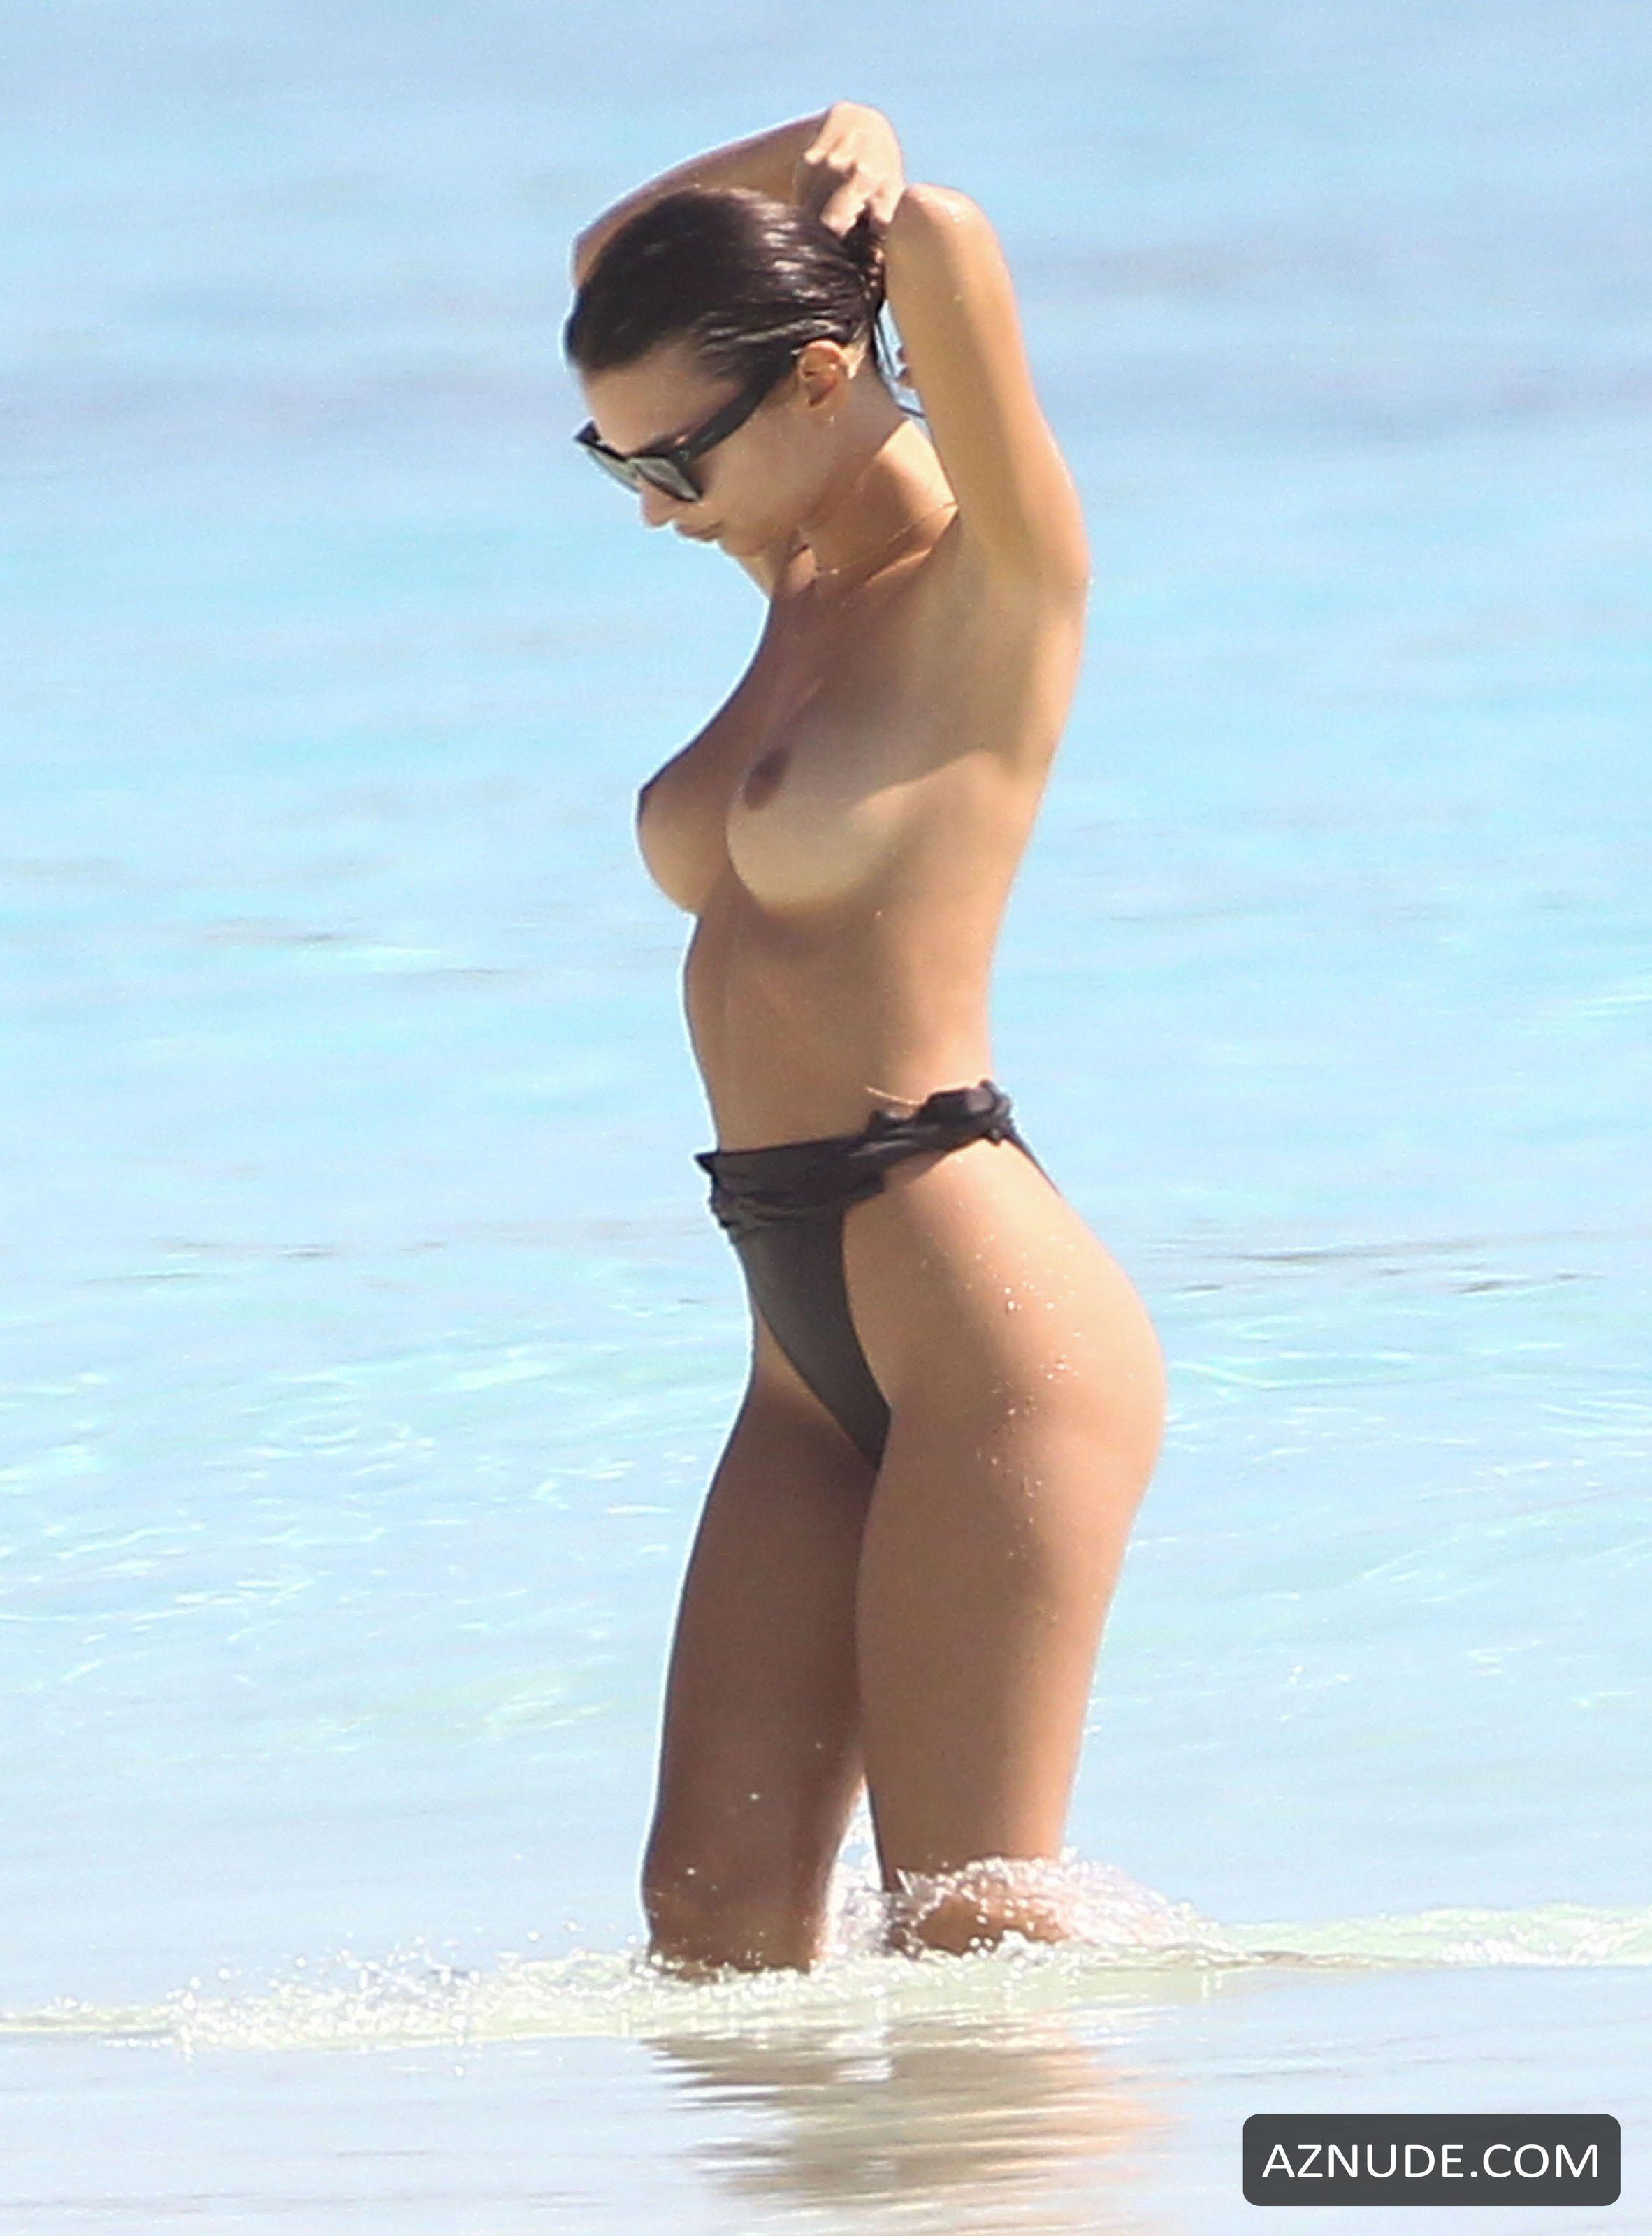 Hots Cancun Nude Beach Gallery HD